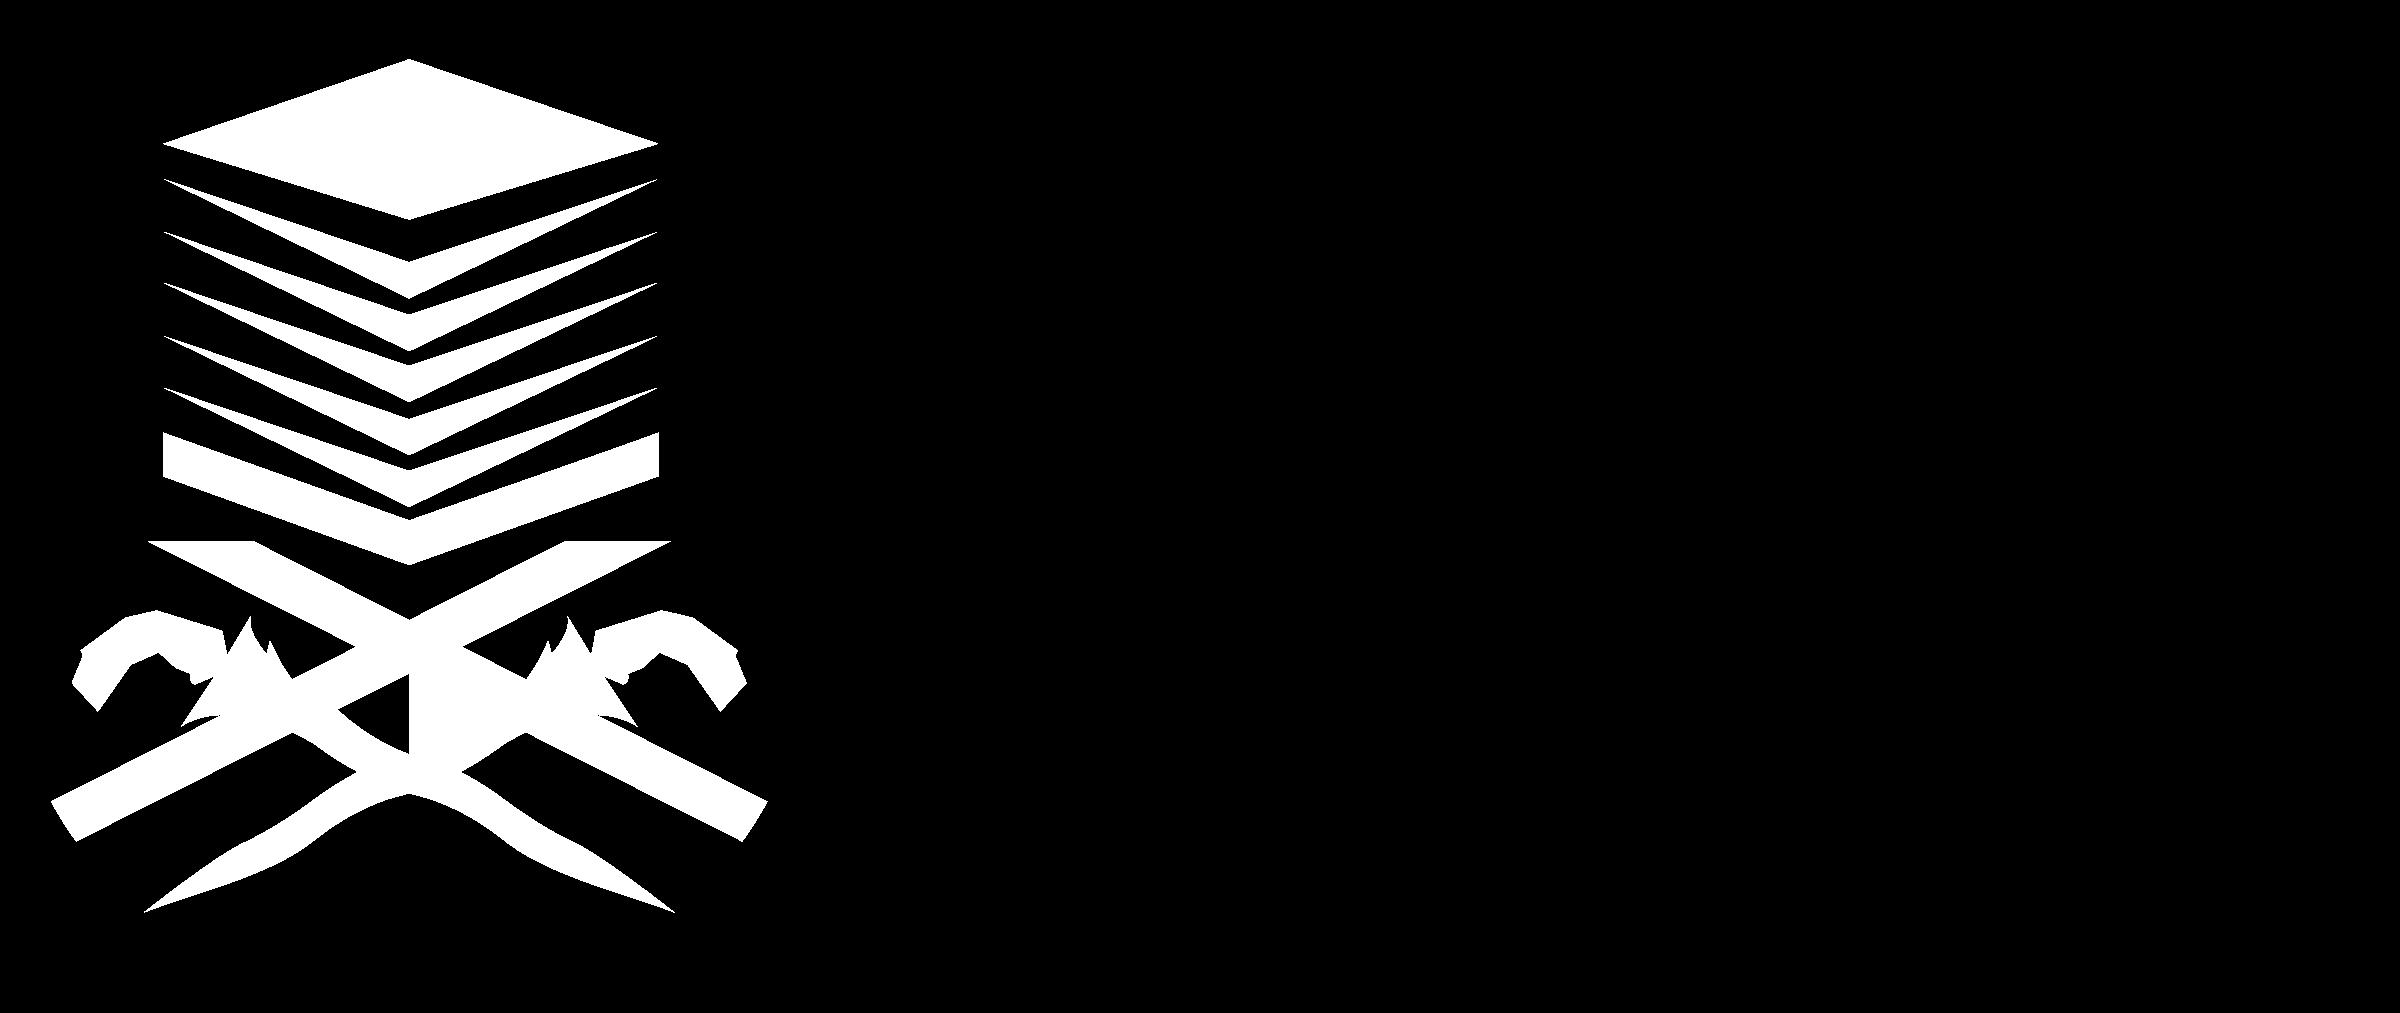 Uitm Universiti Teknologi Mara Logo Png Transparent Svg Vector